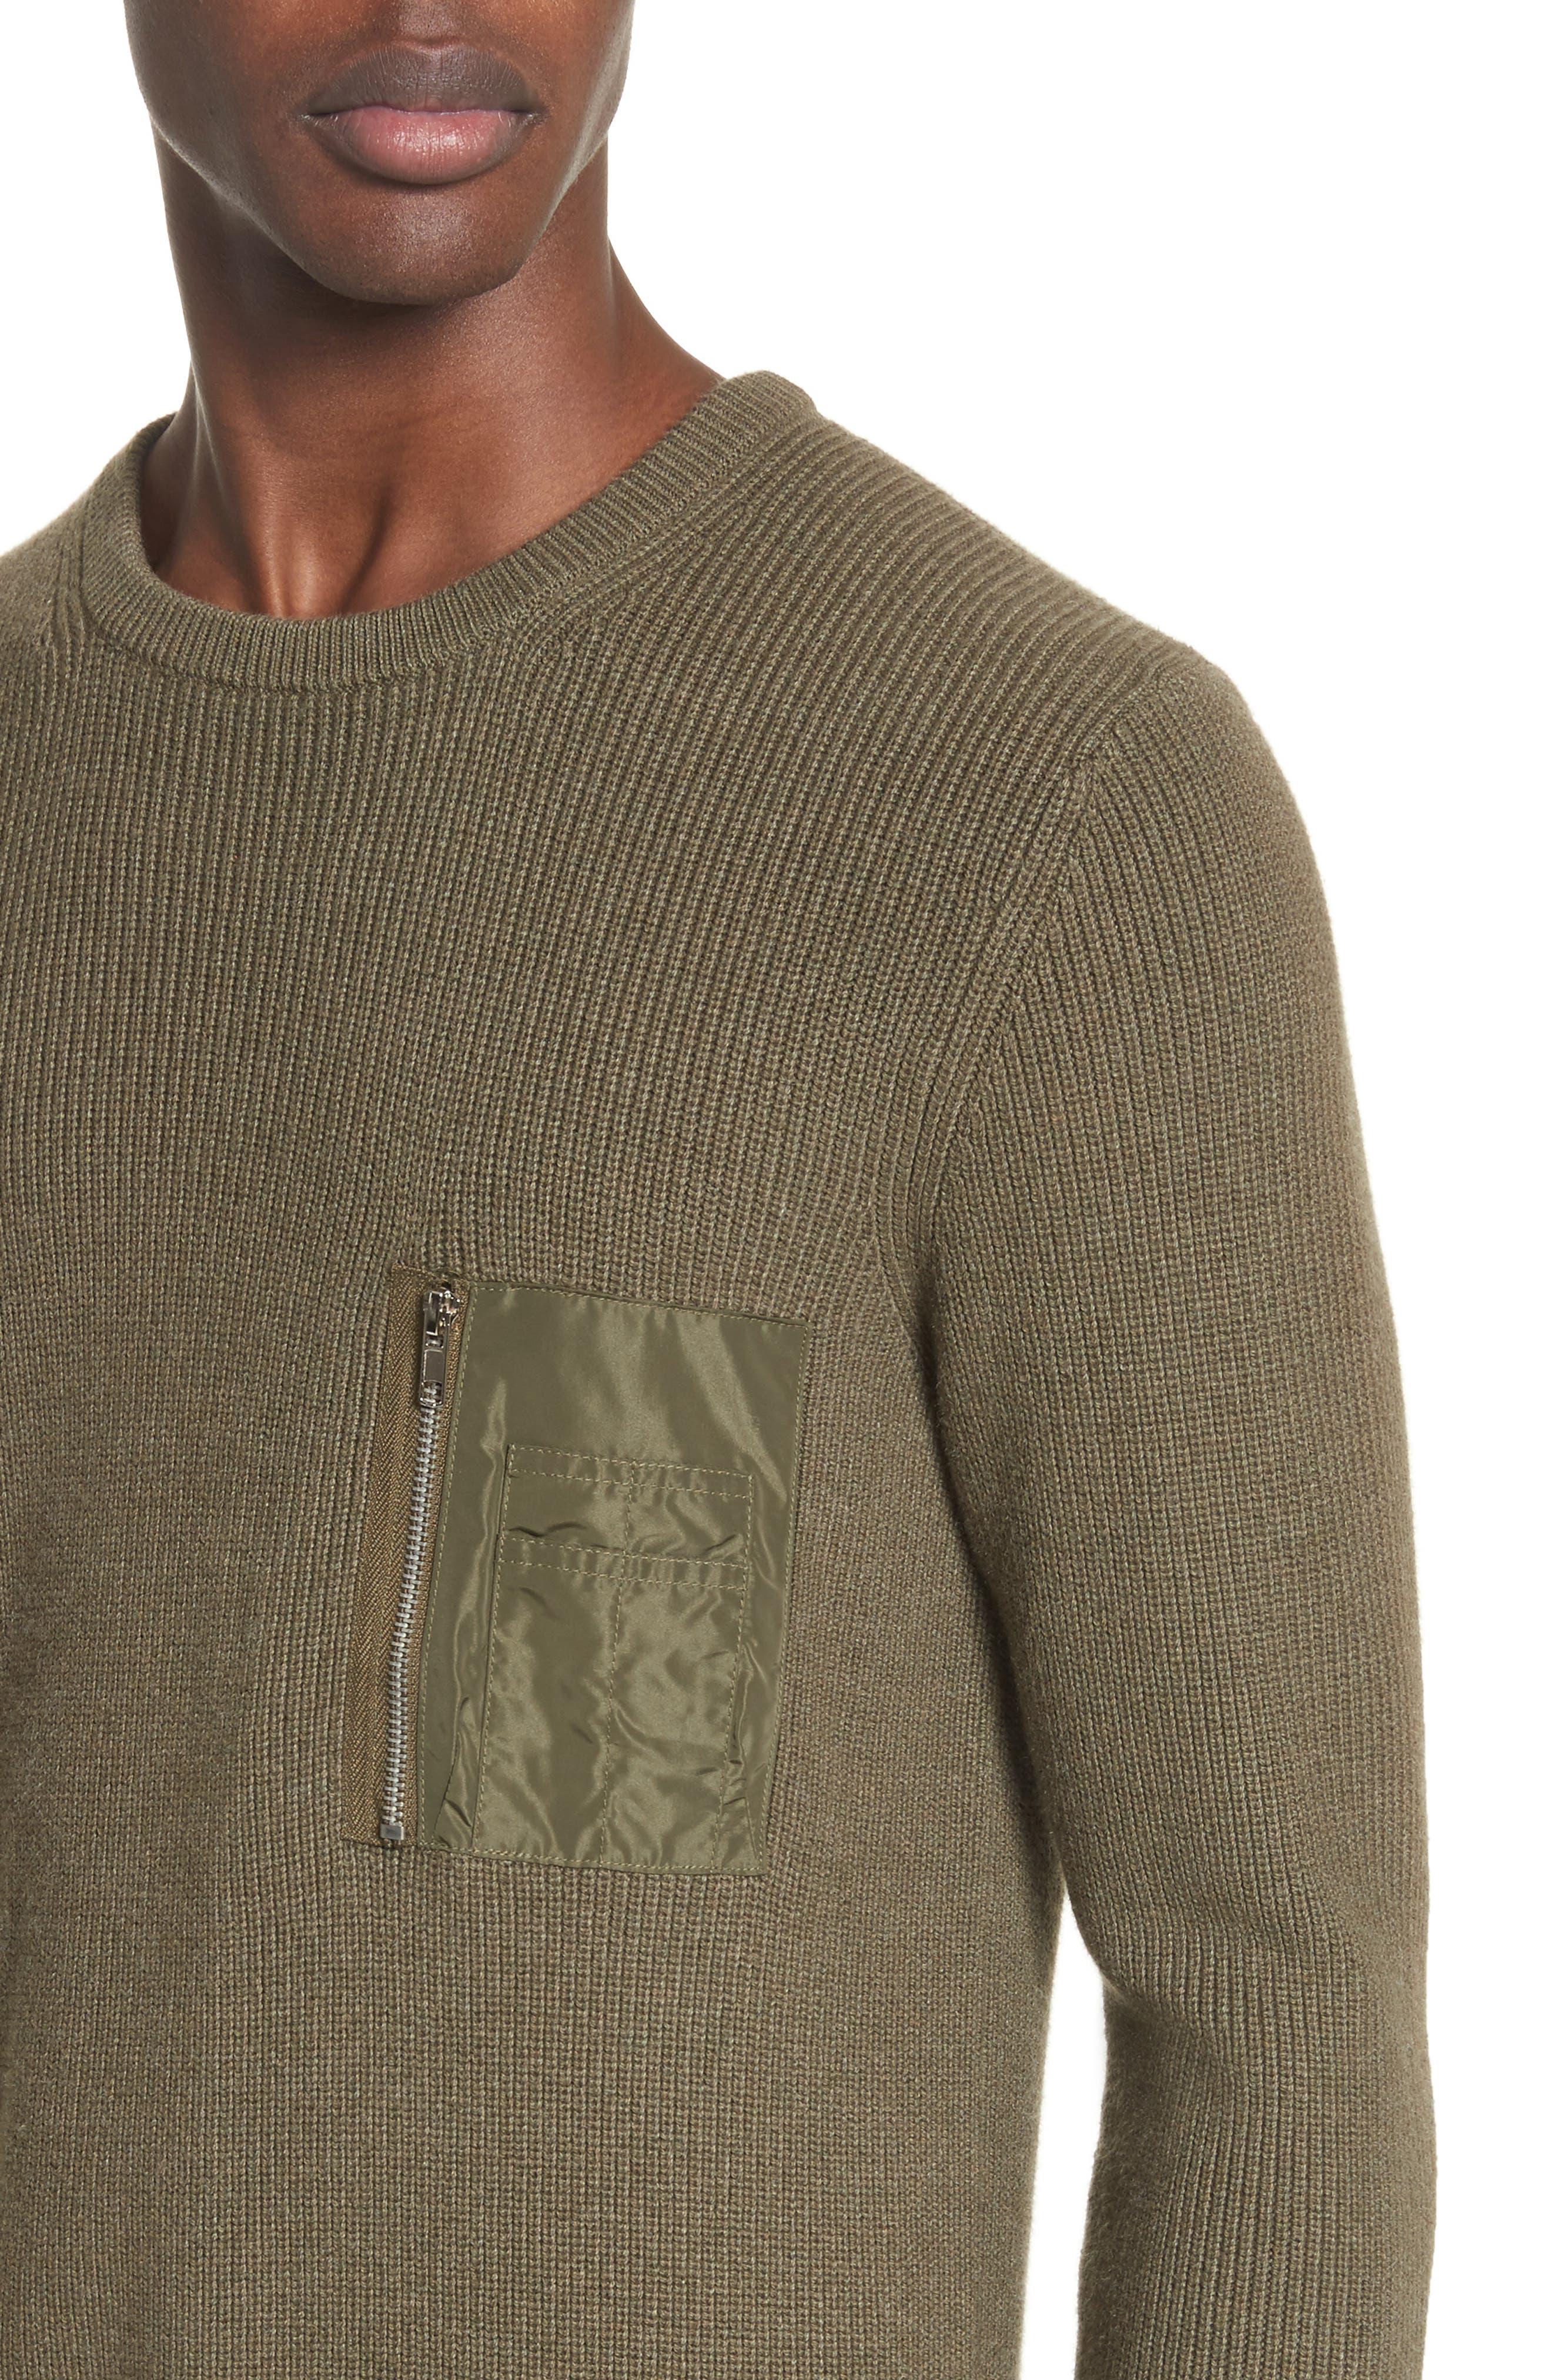 Crewneck Cotton Blend Sweater,                             Alternate thumbnail 4, color,                             Green